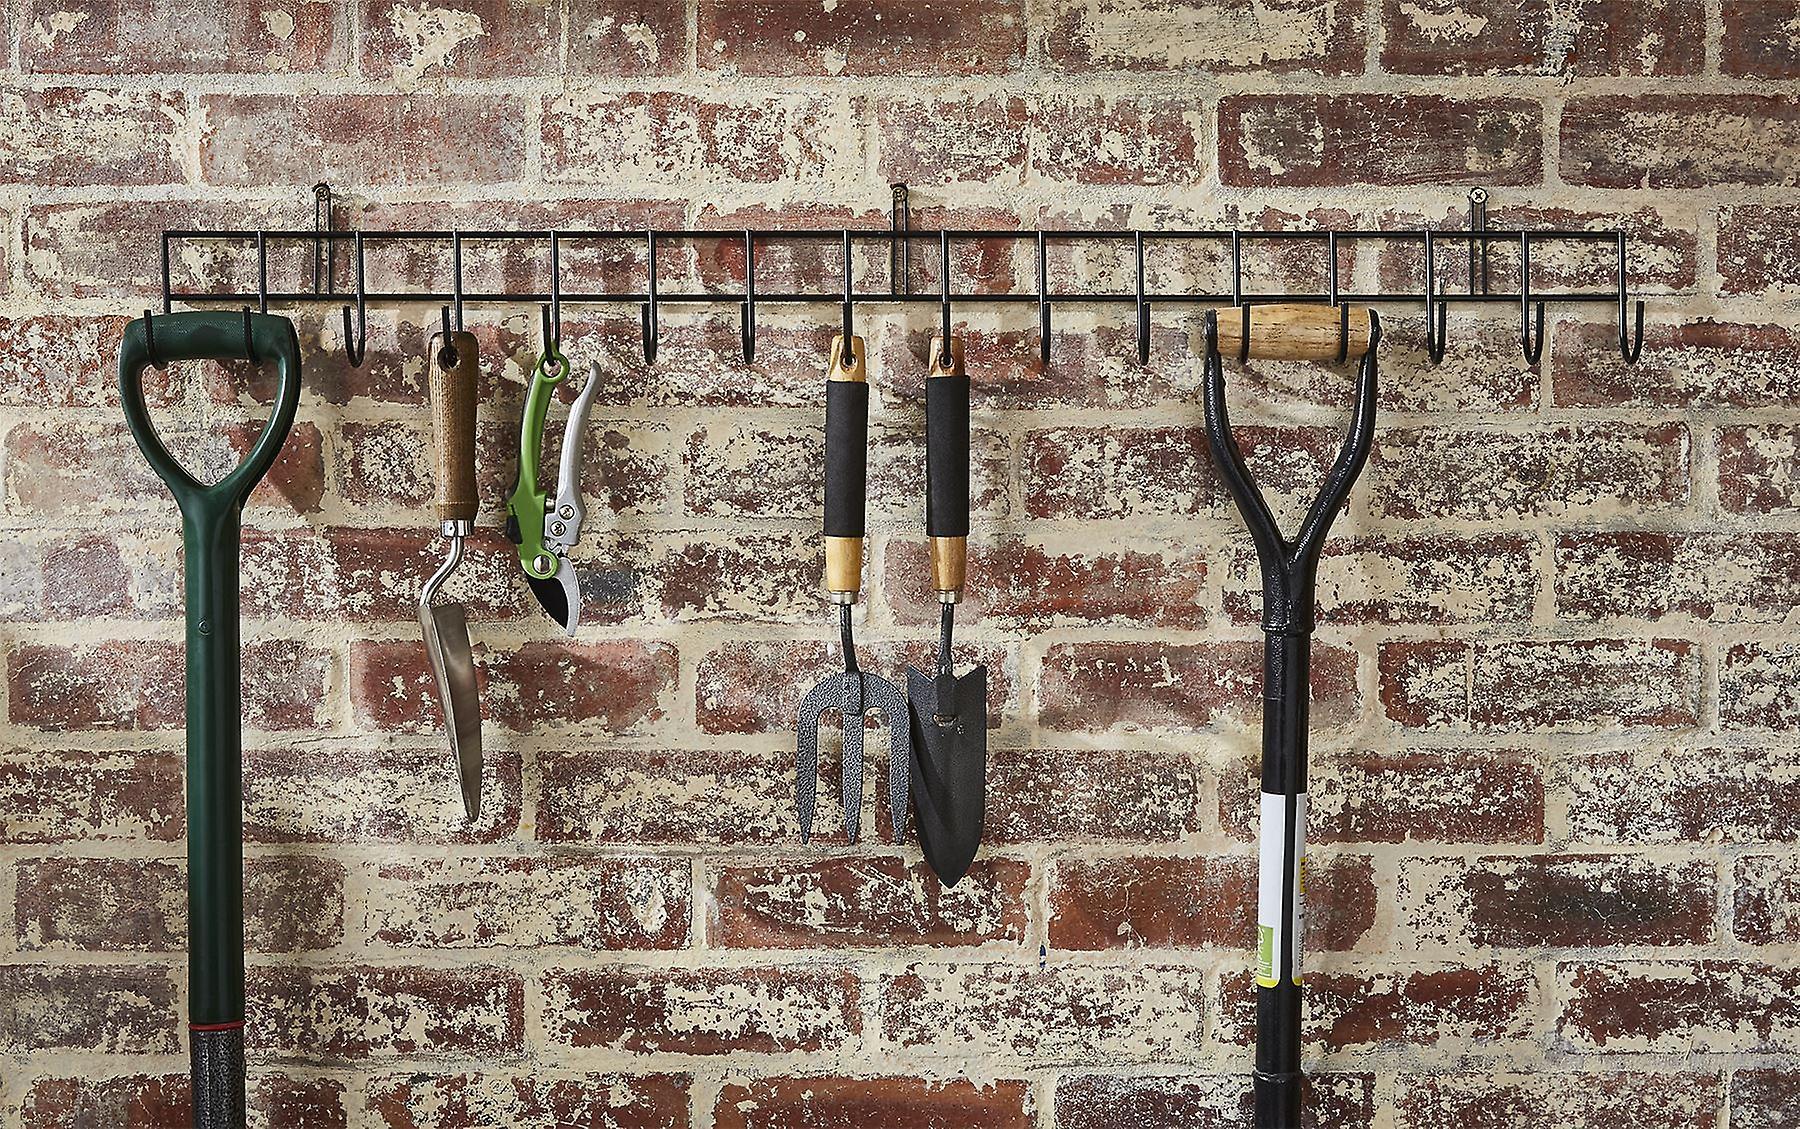 Extra-Long Tool Rack In Black Powder Coating